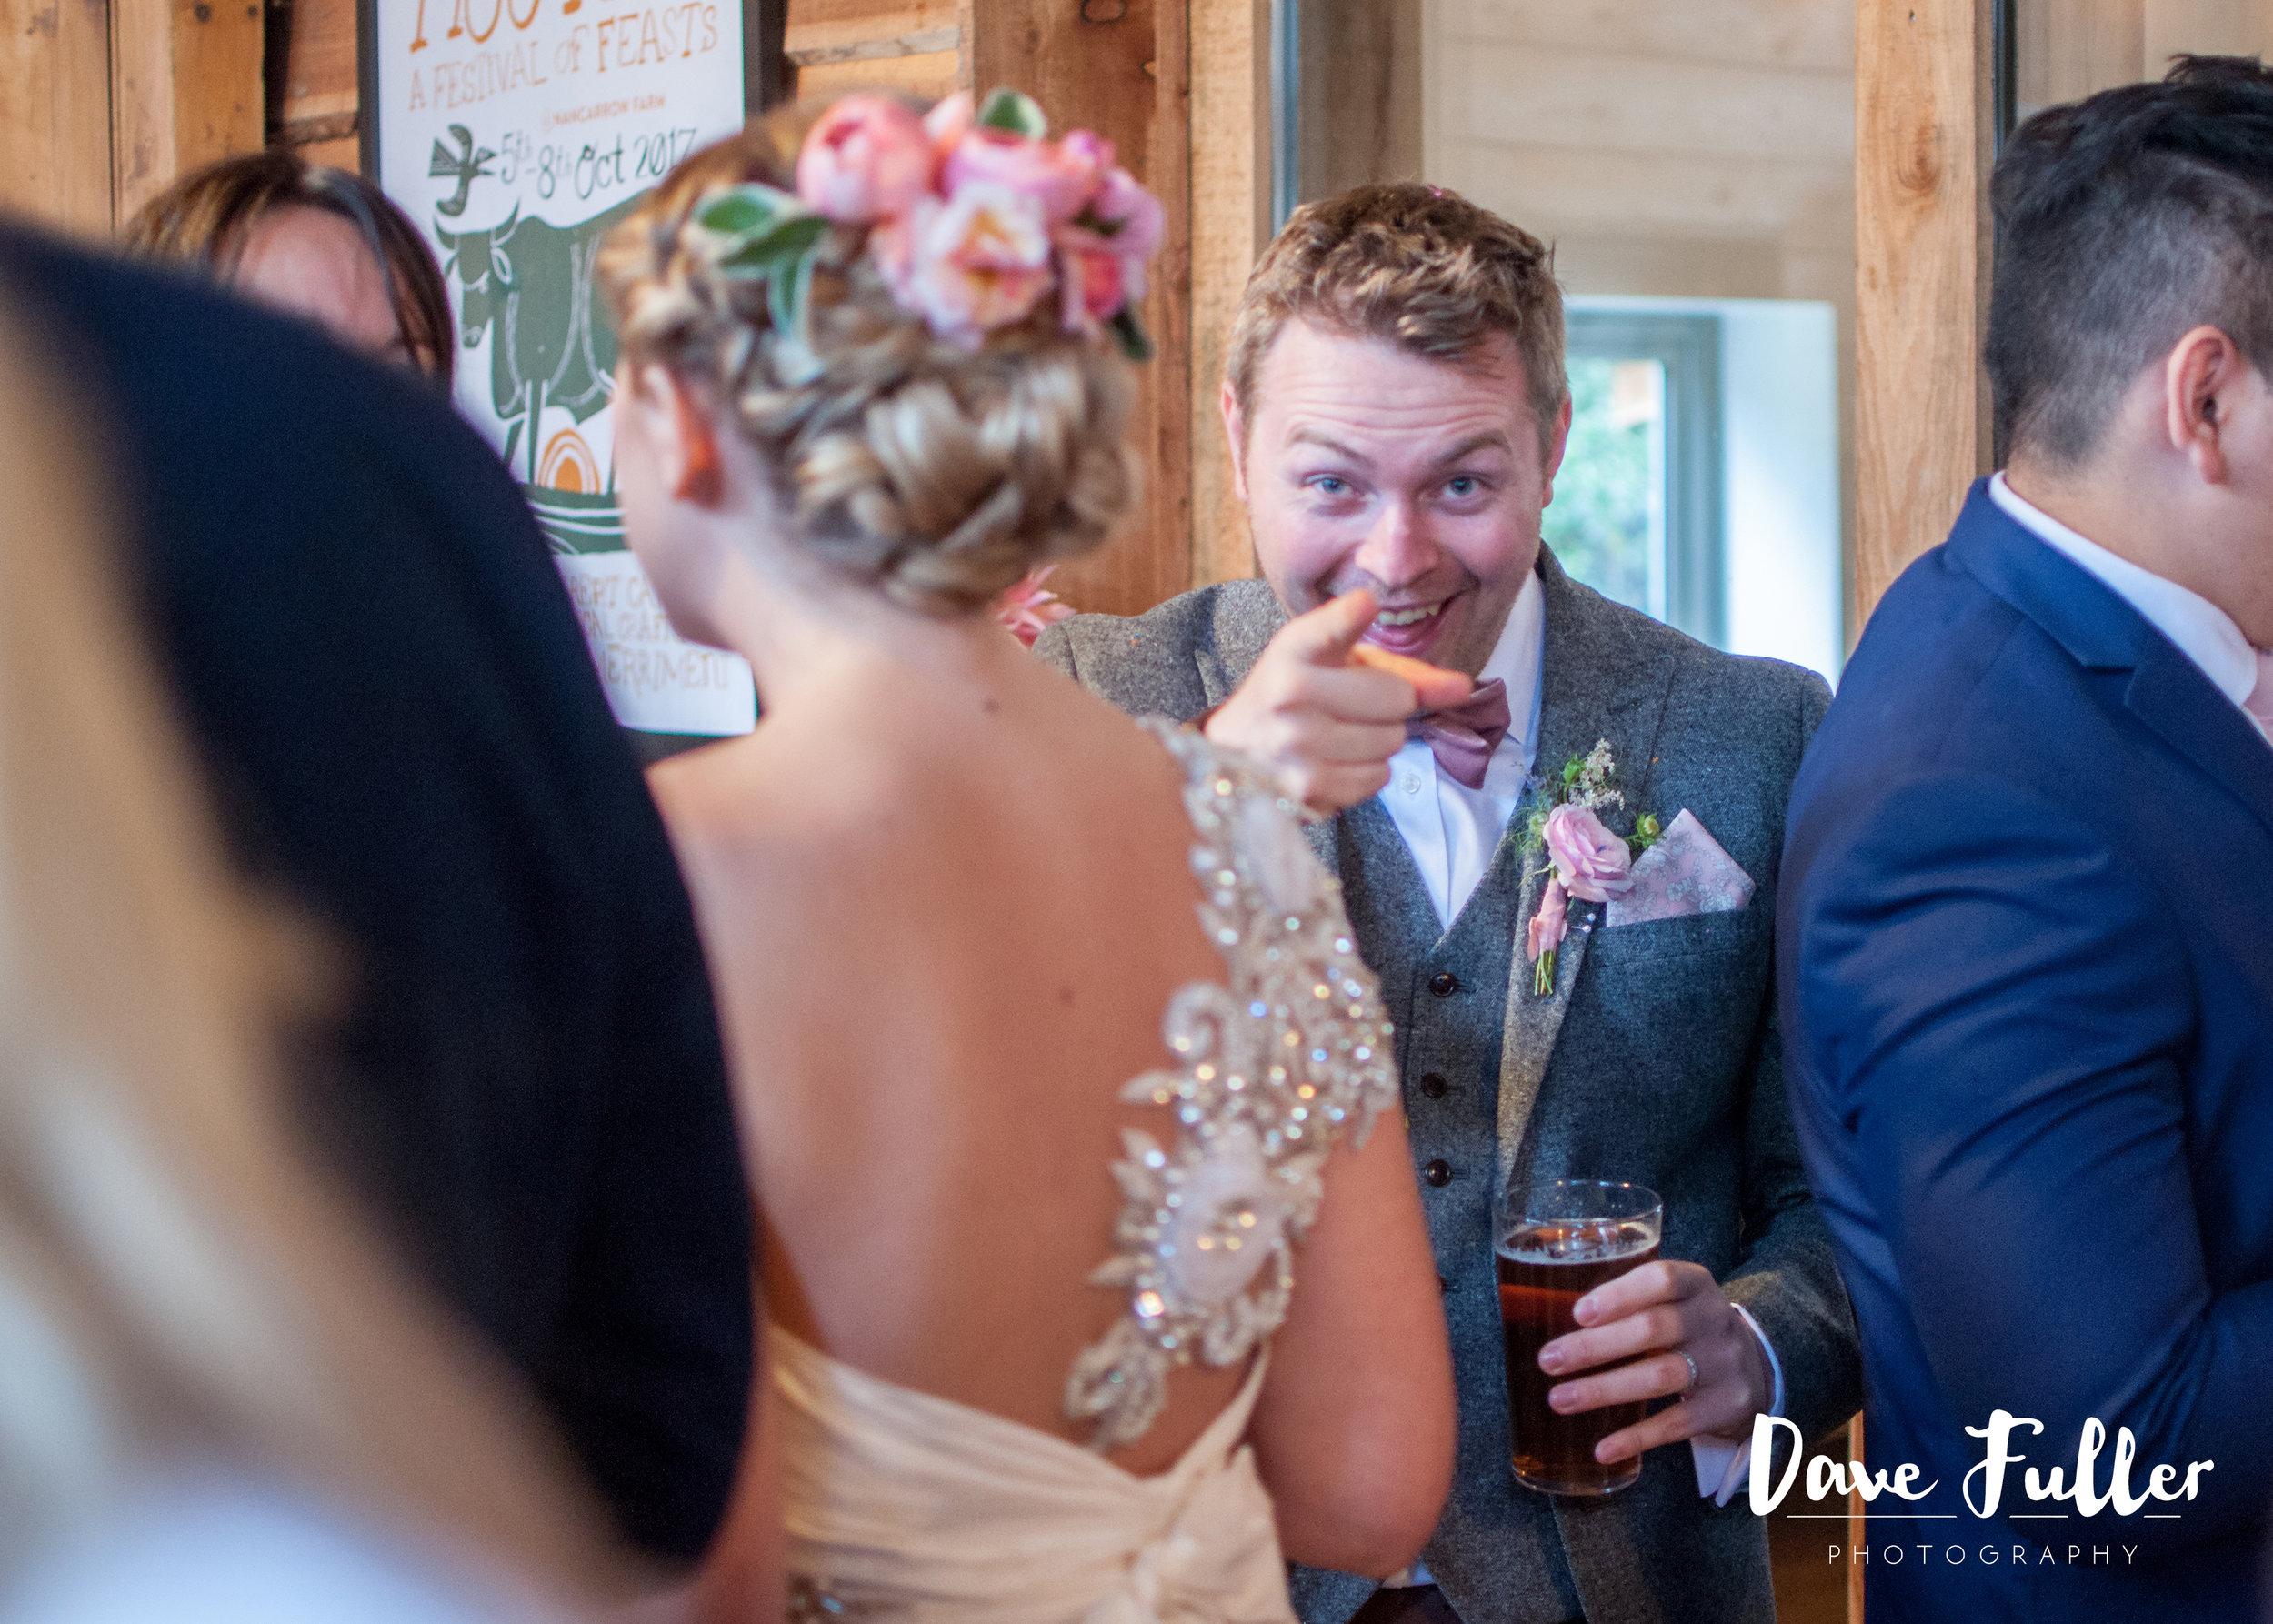 Nottingham Wedding PhotographerMckellar-Savage6.jpg